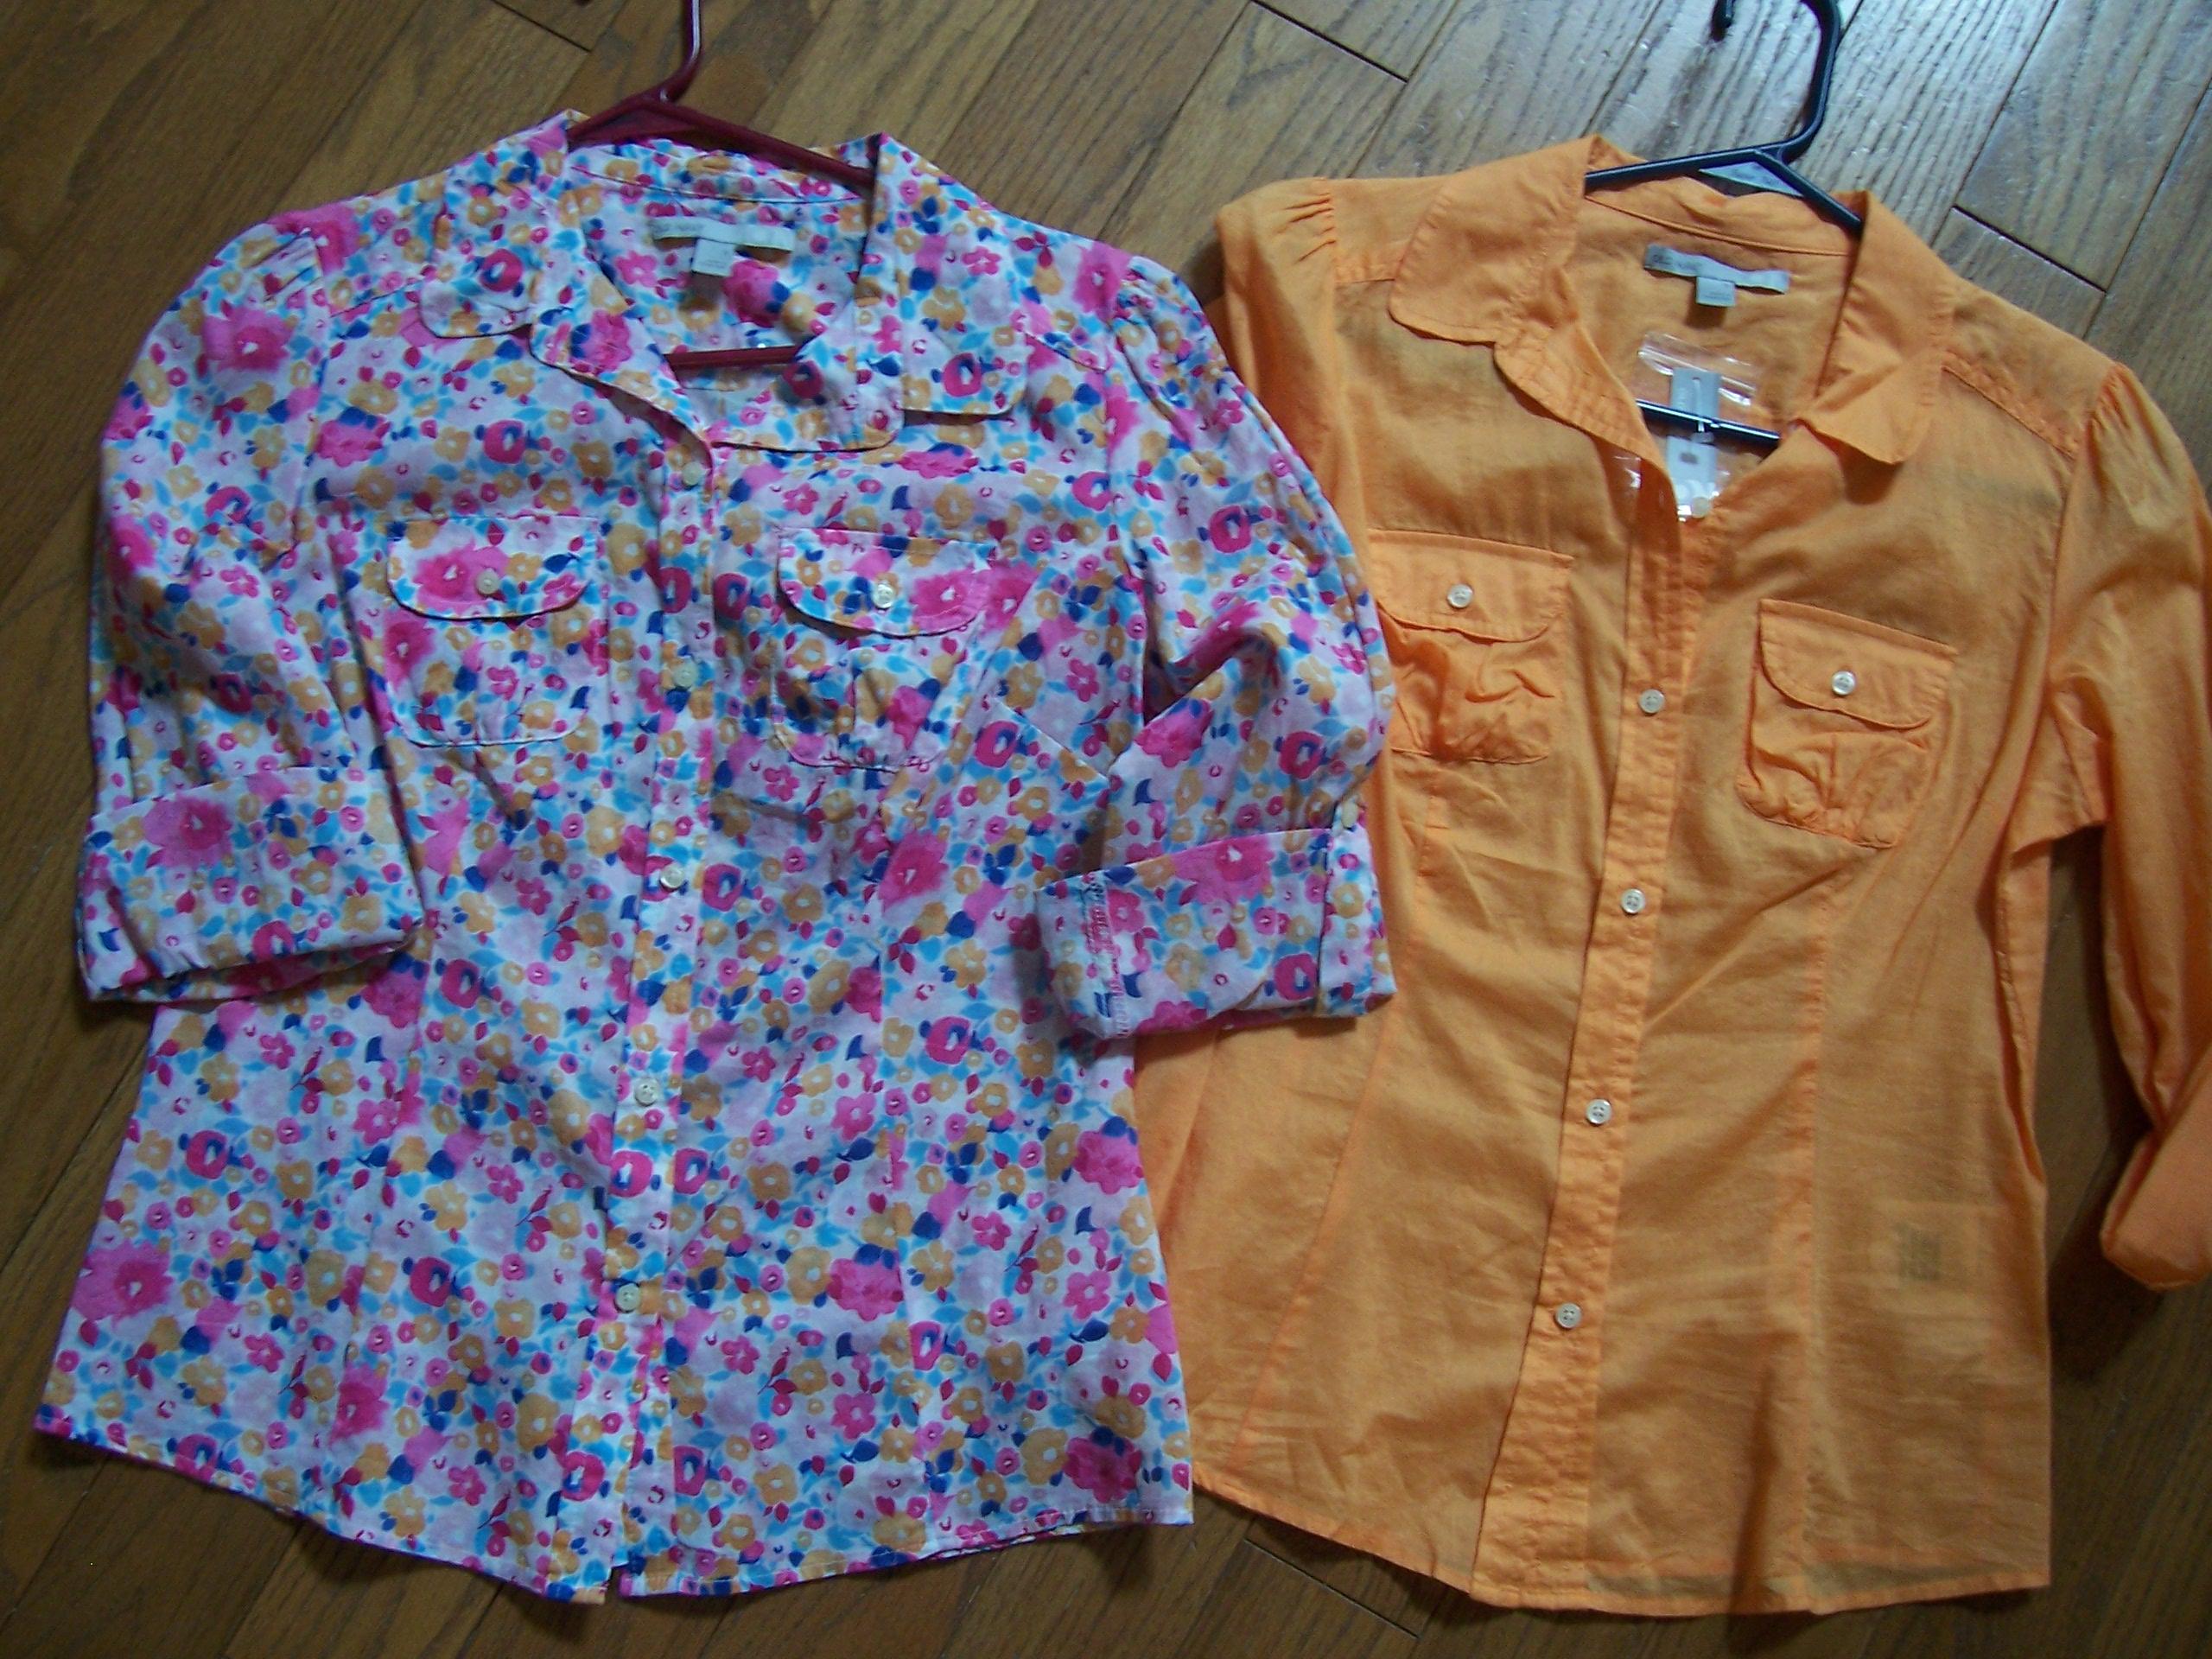 Old Navy women's blouses